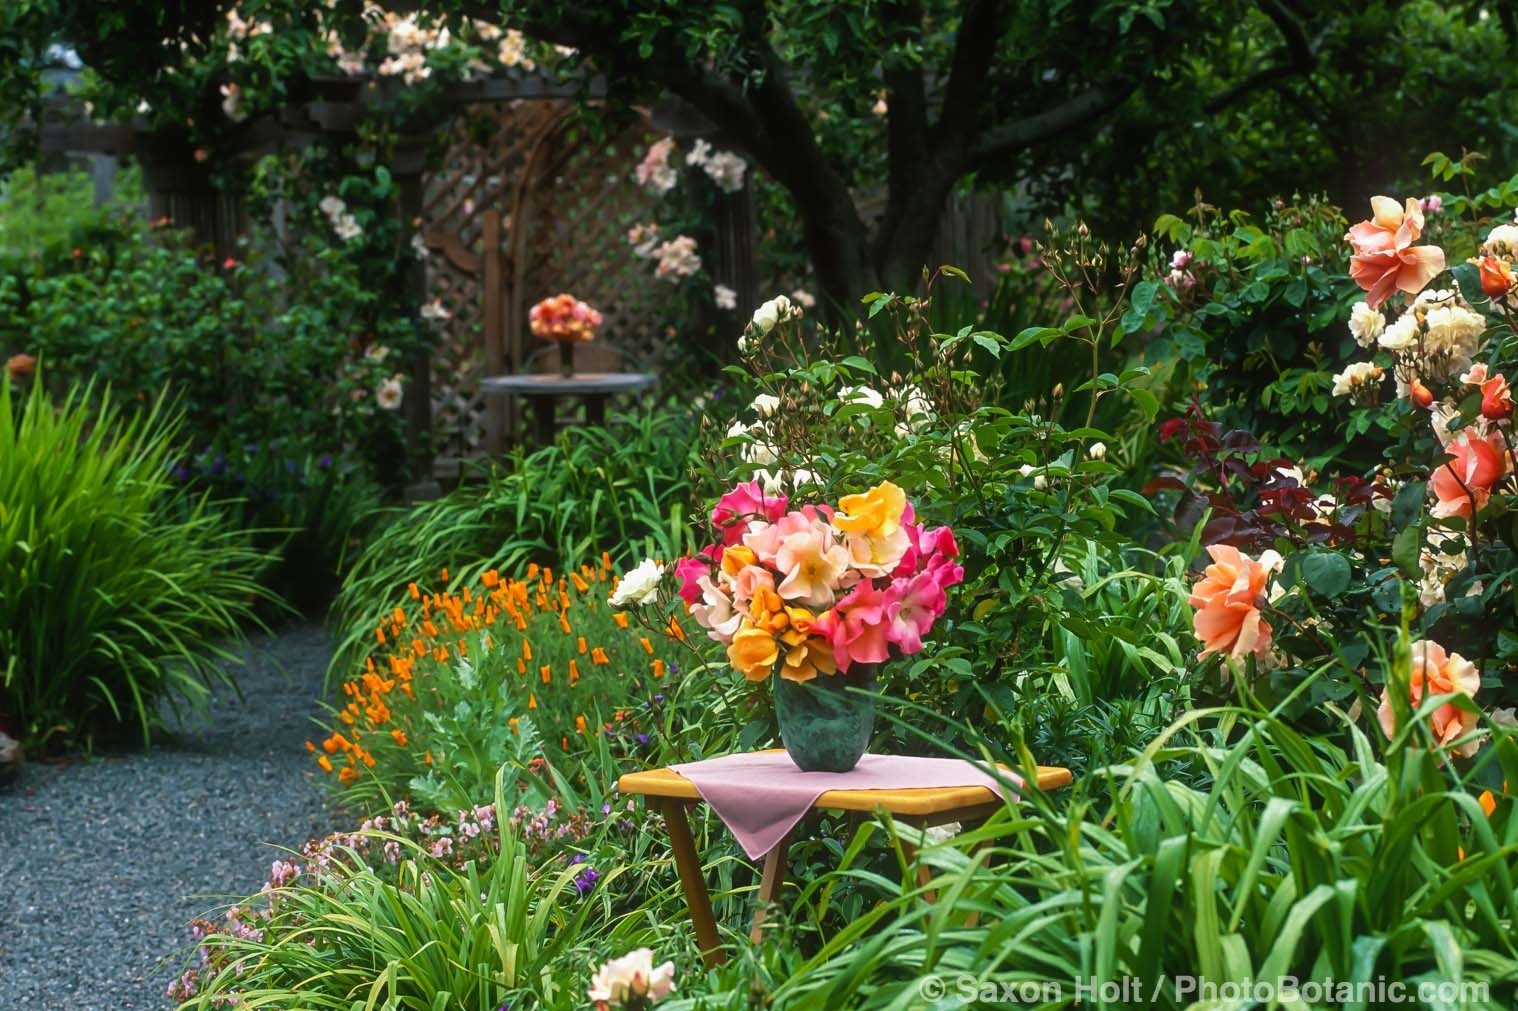 Rose bouquet, floral arrangement outdoors in Sally Roberston garden